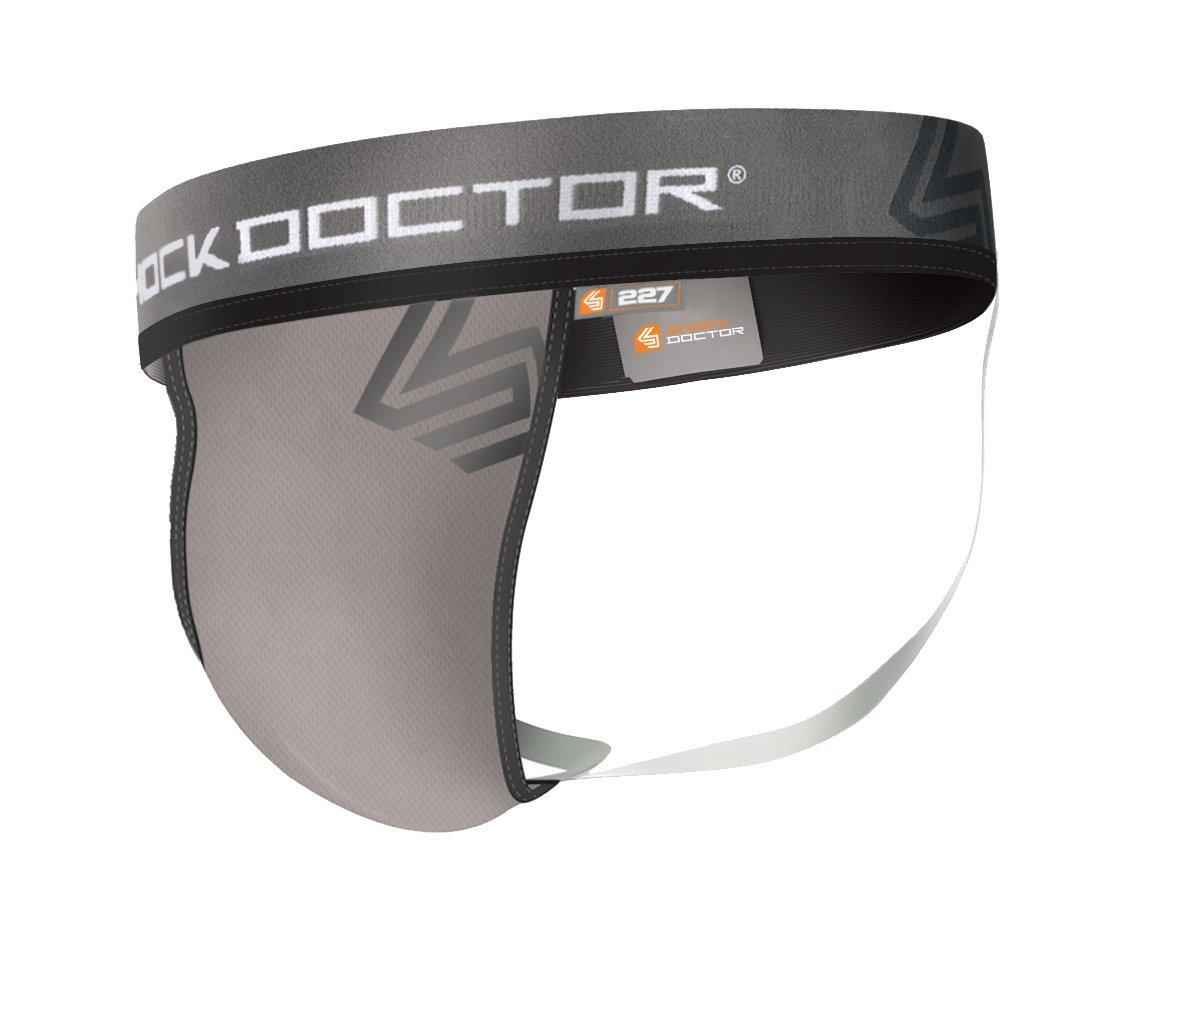 Mens /& Boys Shock Doctor Core Supporter Jockstrap w//Soft Cup